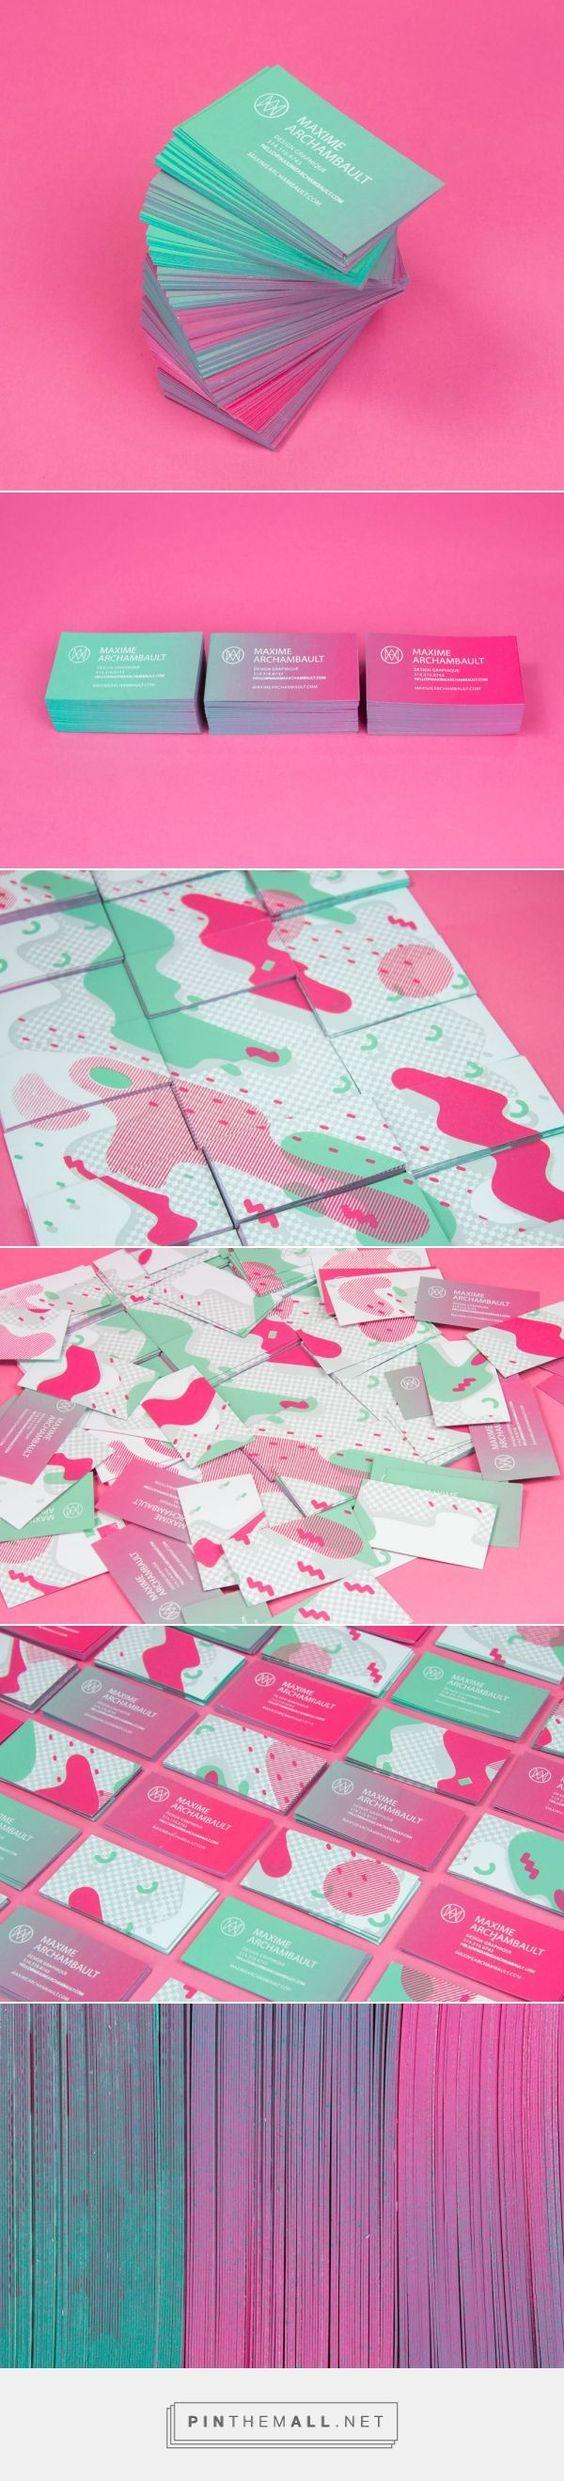 Maxime Archambault Business Cards on Behance | Fivestar Branding – Design and Branding Agency & Inspiration Gallery